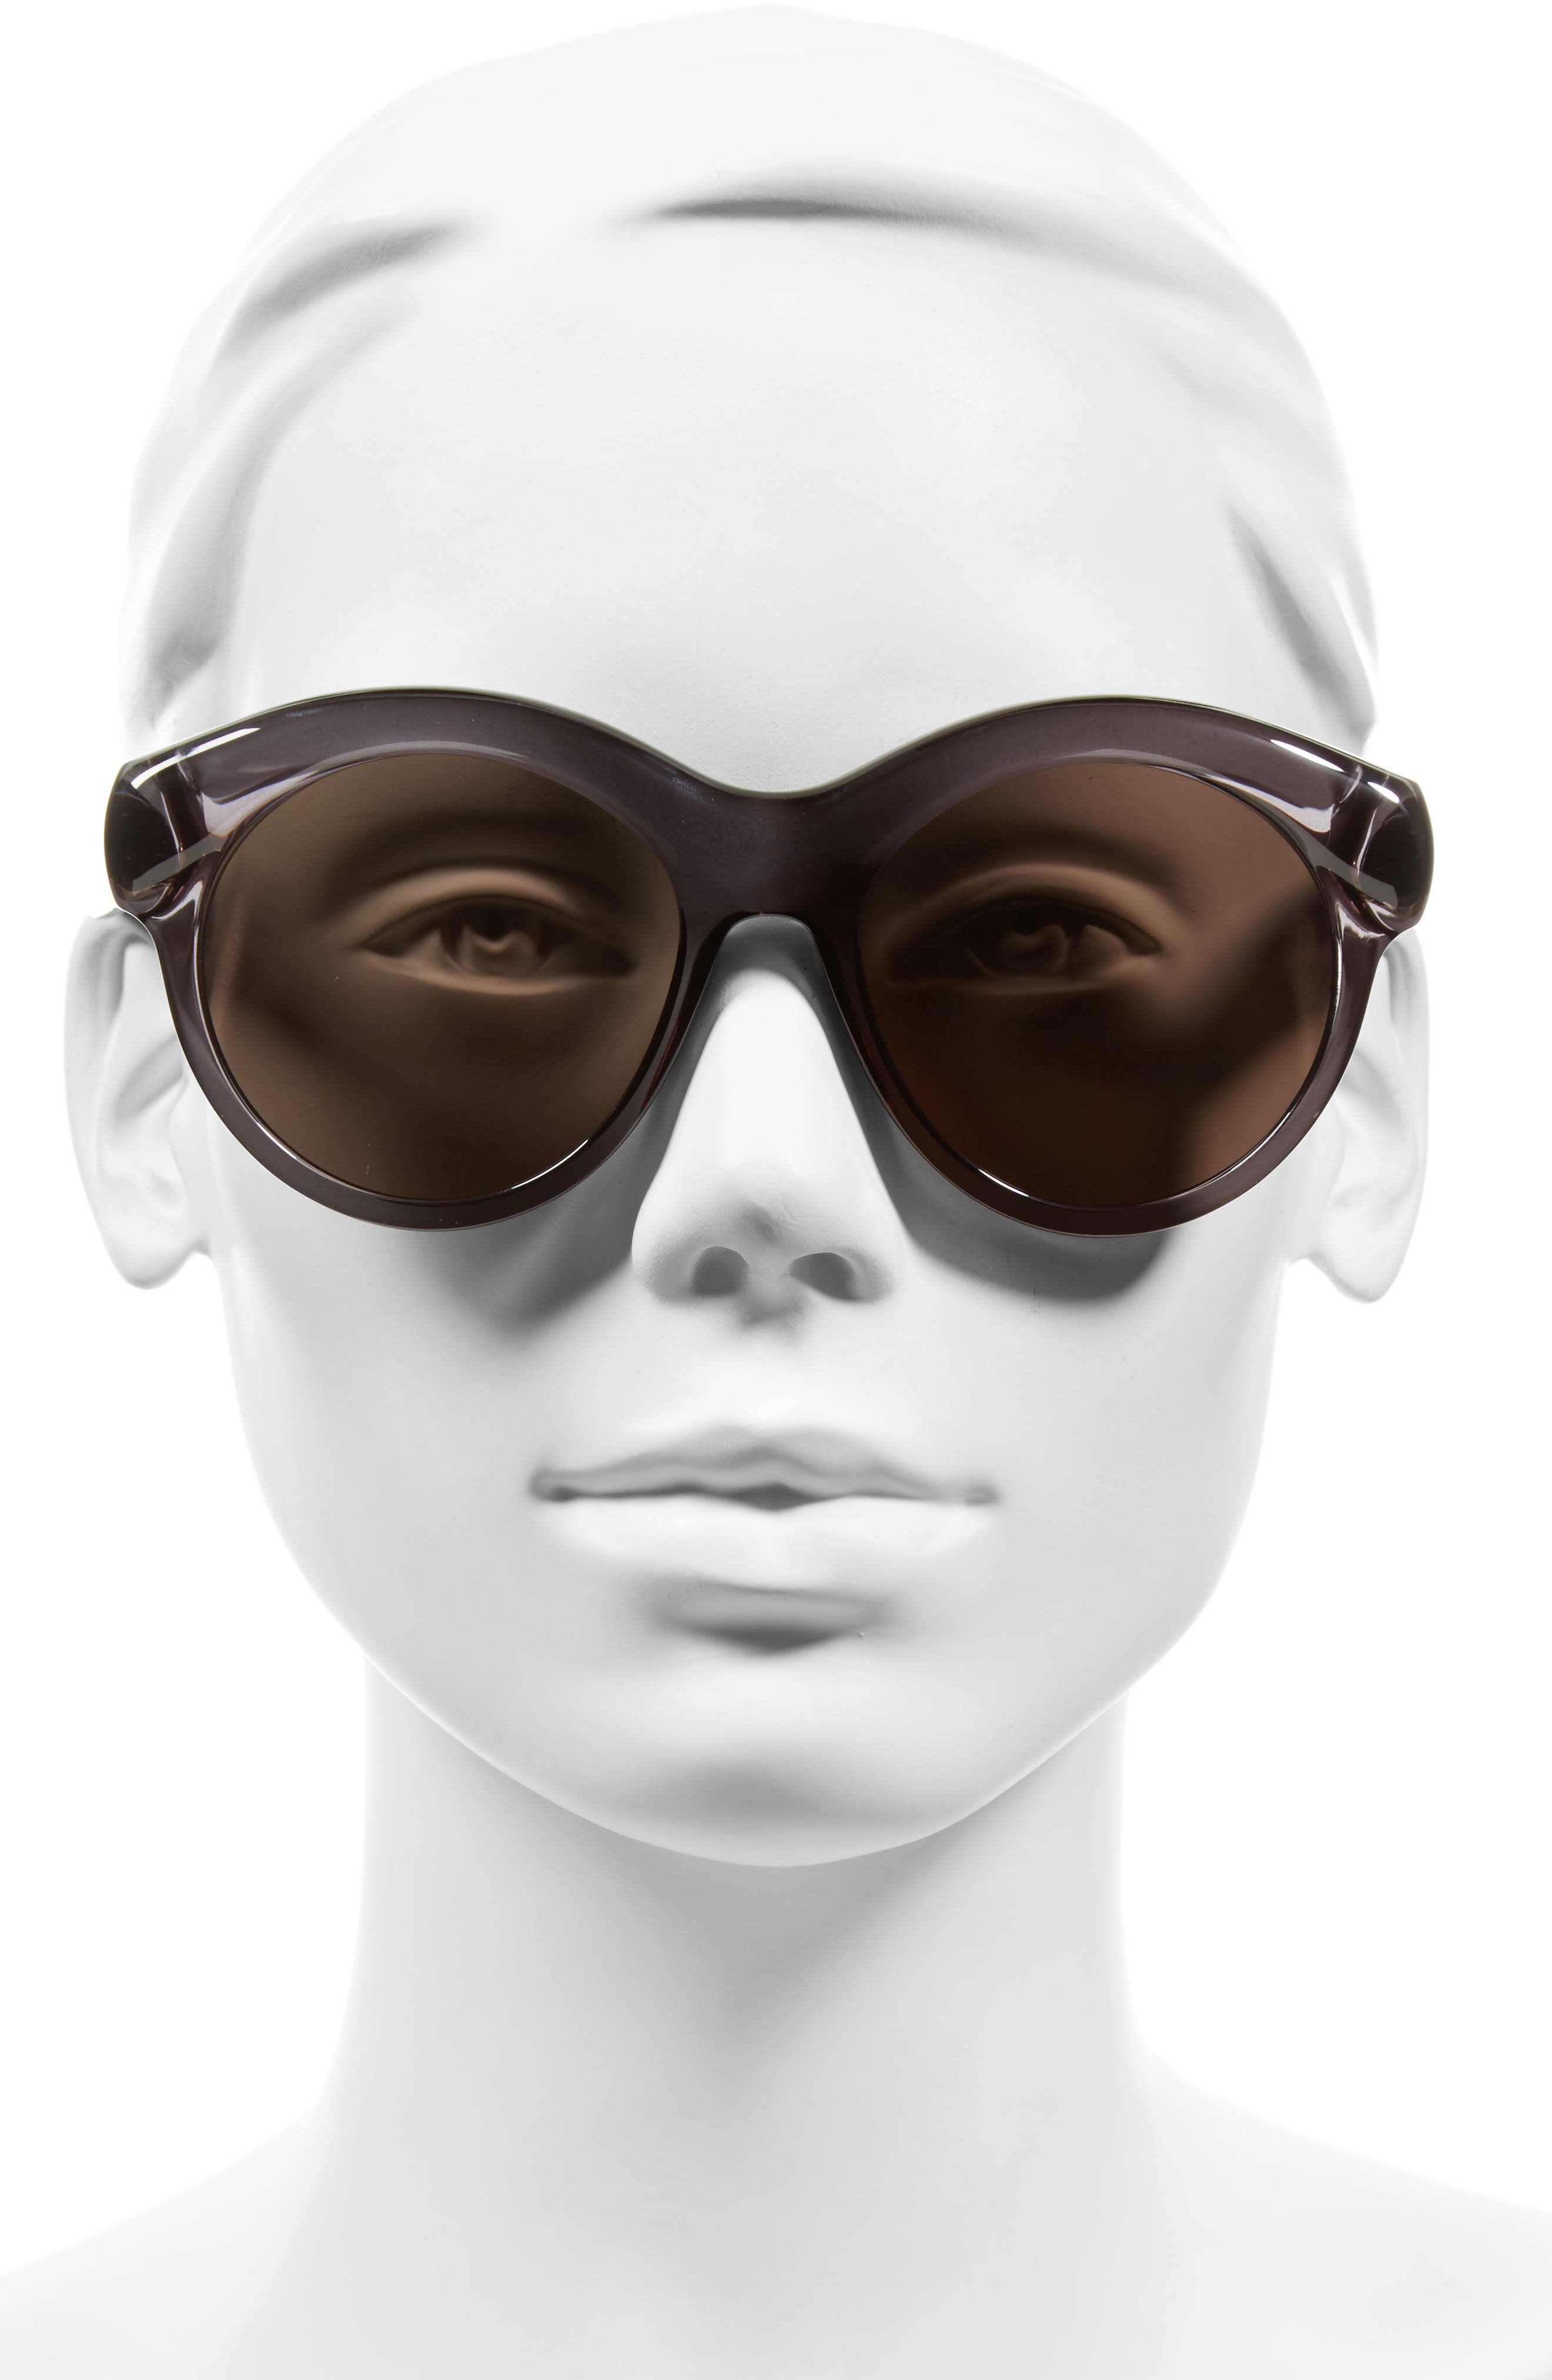 54mm Sunglasses,                             Alternate thumbnail 2, color,                             020